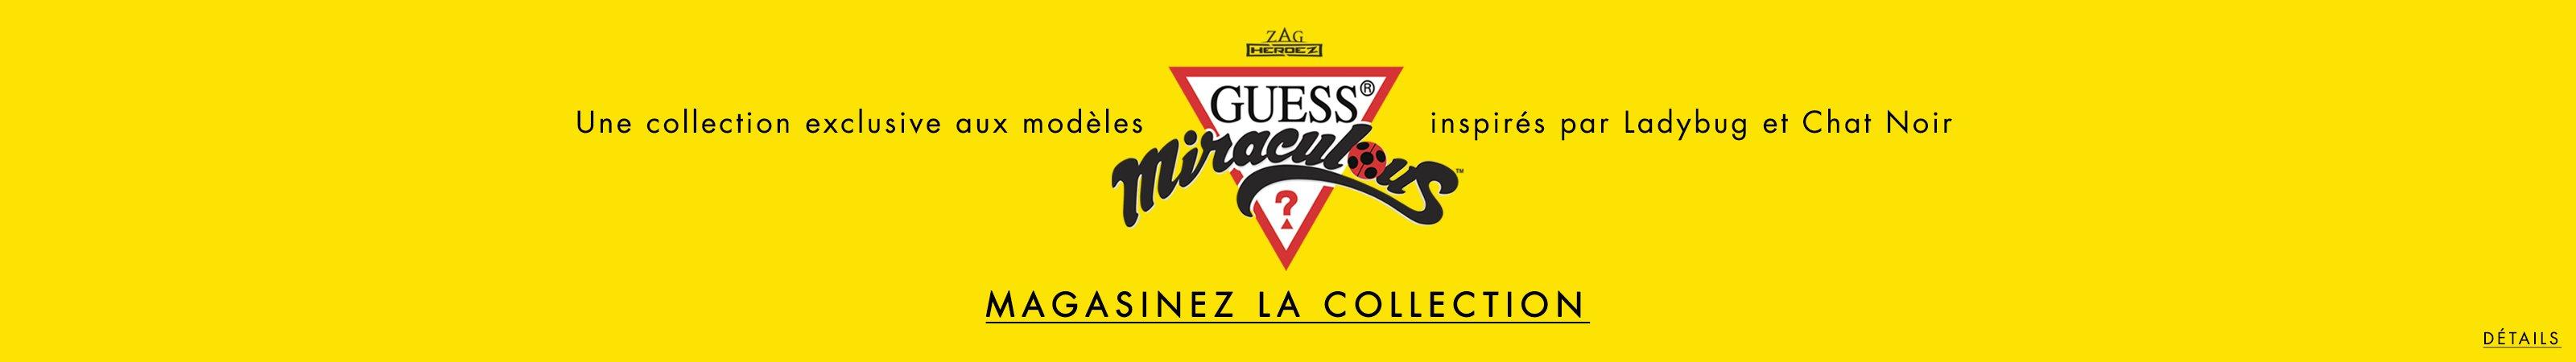 GUESS Miraculous